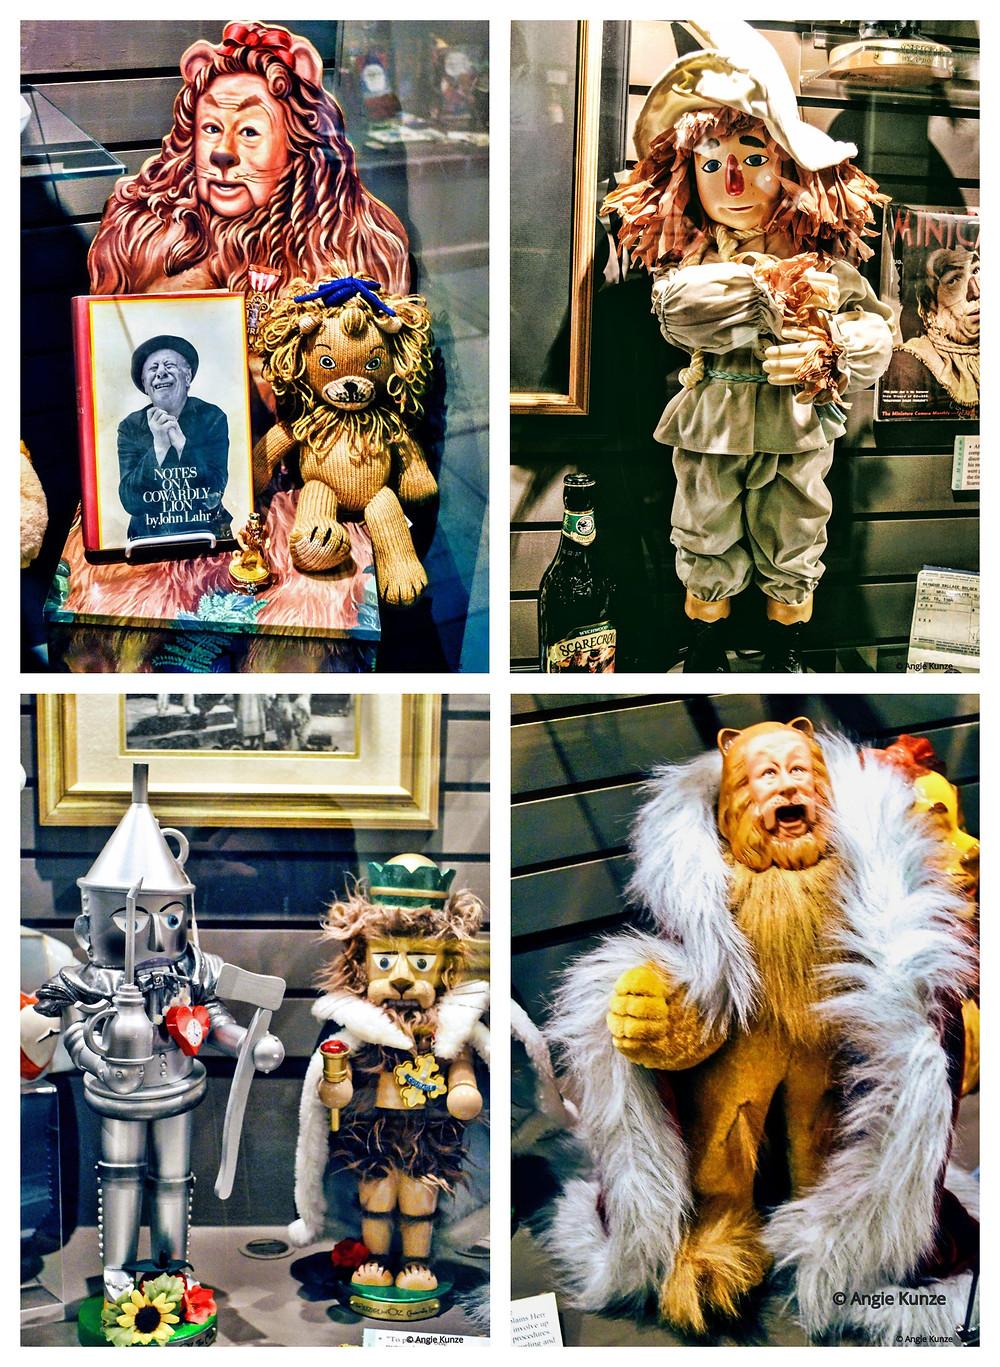 Wizard of Oz memorabilia at the Oz Museum in Wamego Kansas